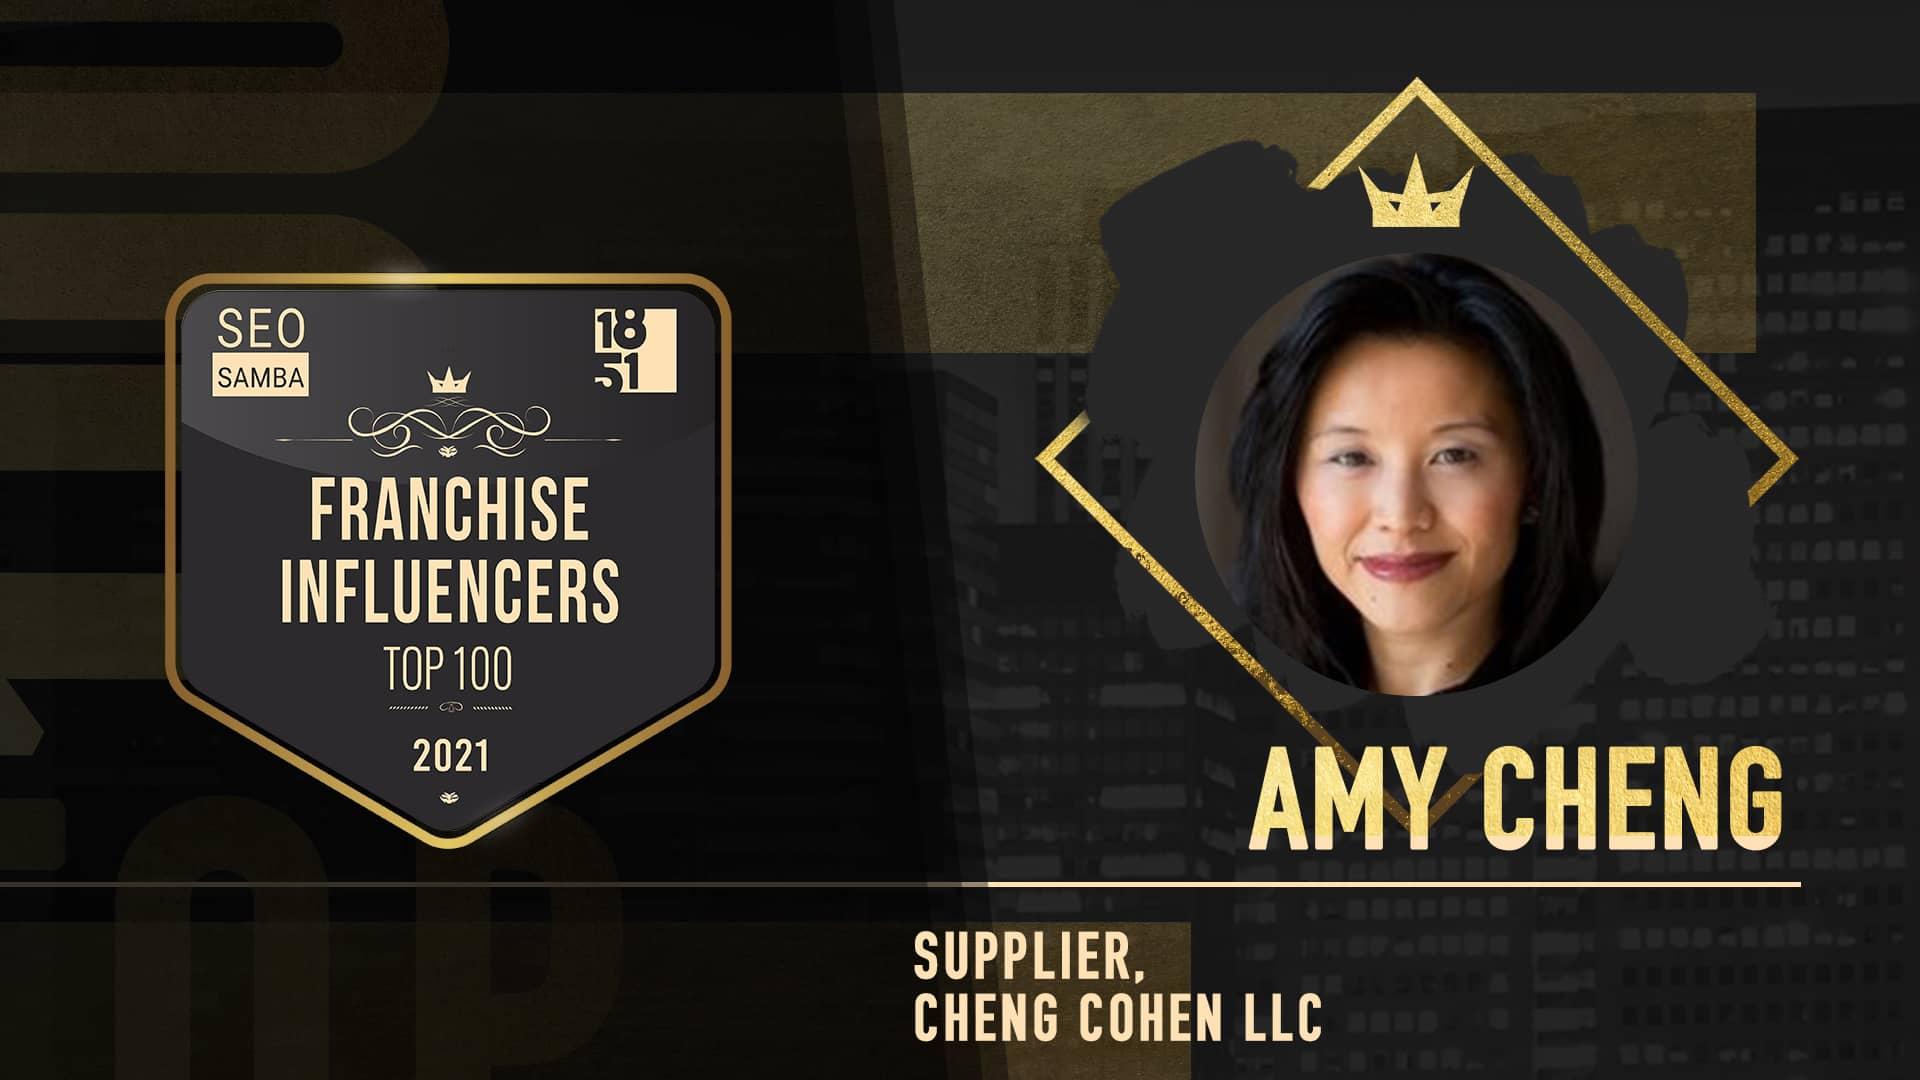 amy-cheng-cheng-cohen-llc